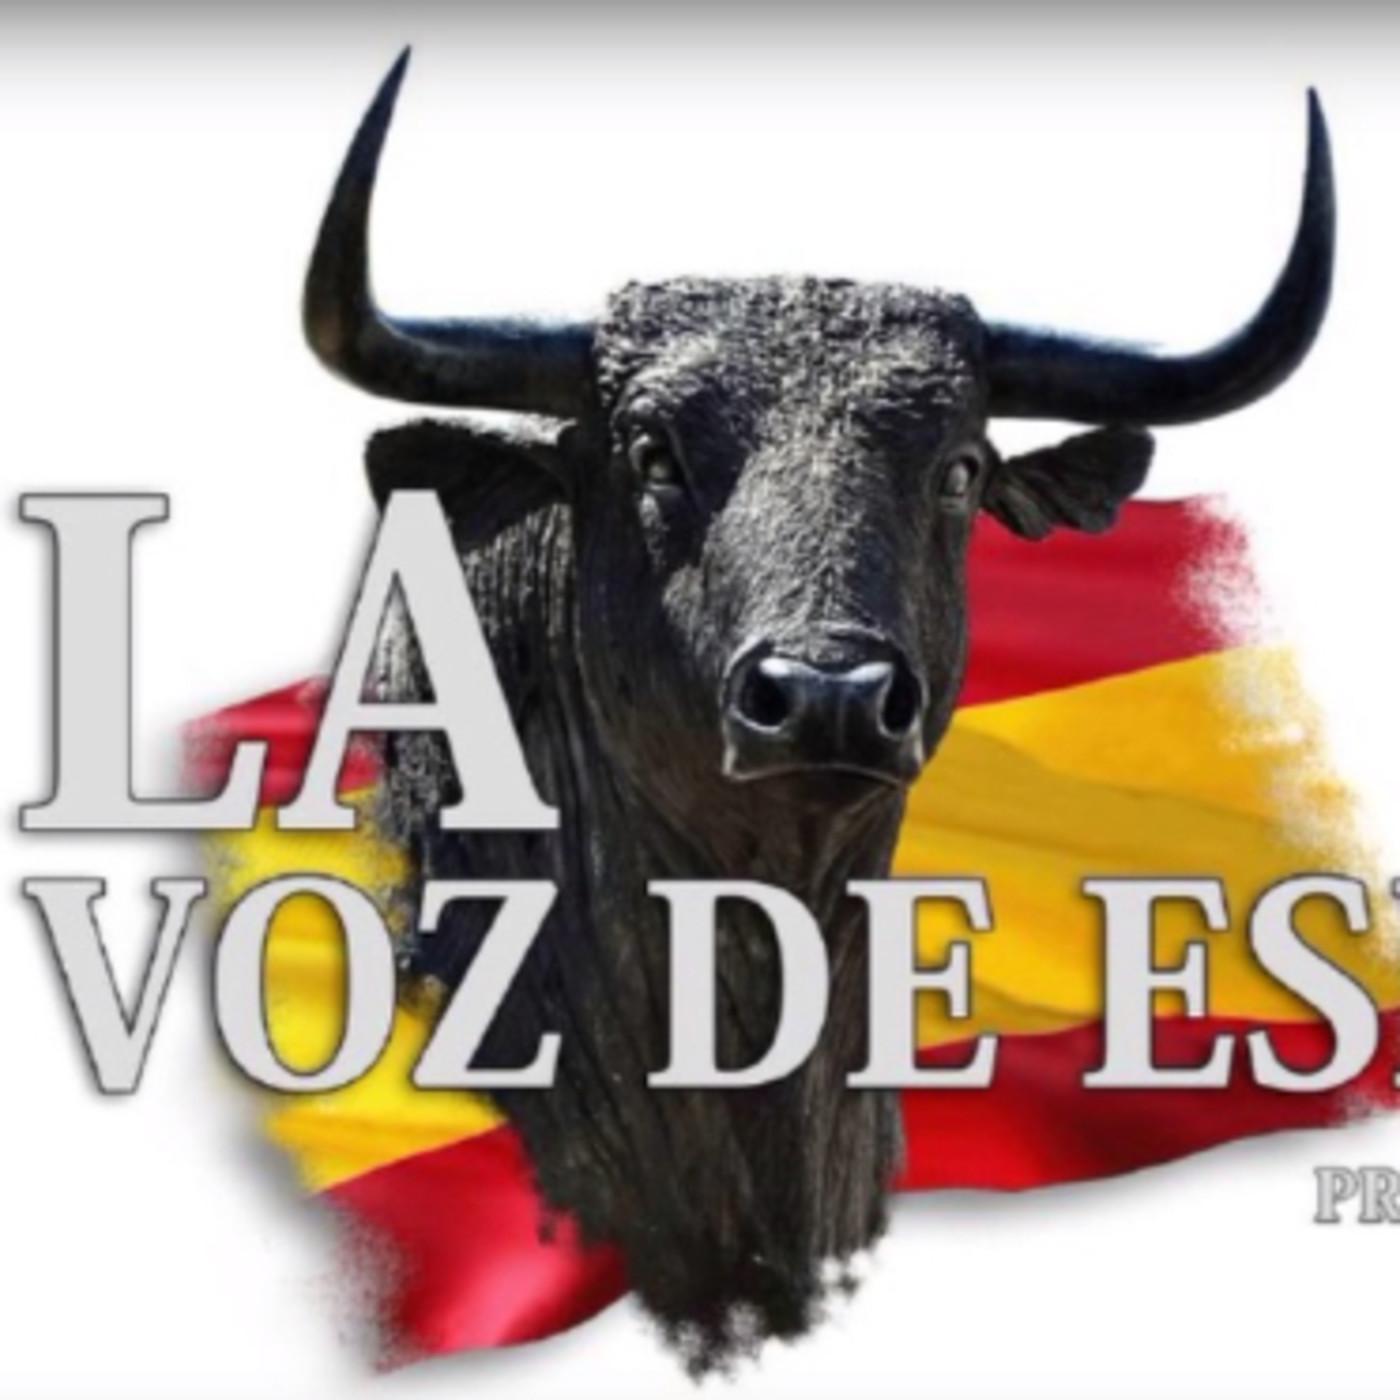 LA VOZ DE ESPAÑA Ed: 233 (21 de Mayo)